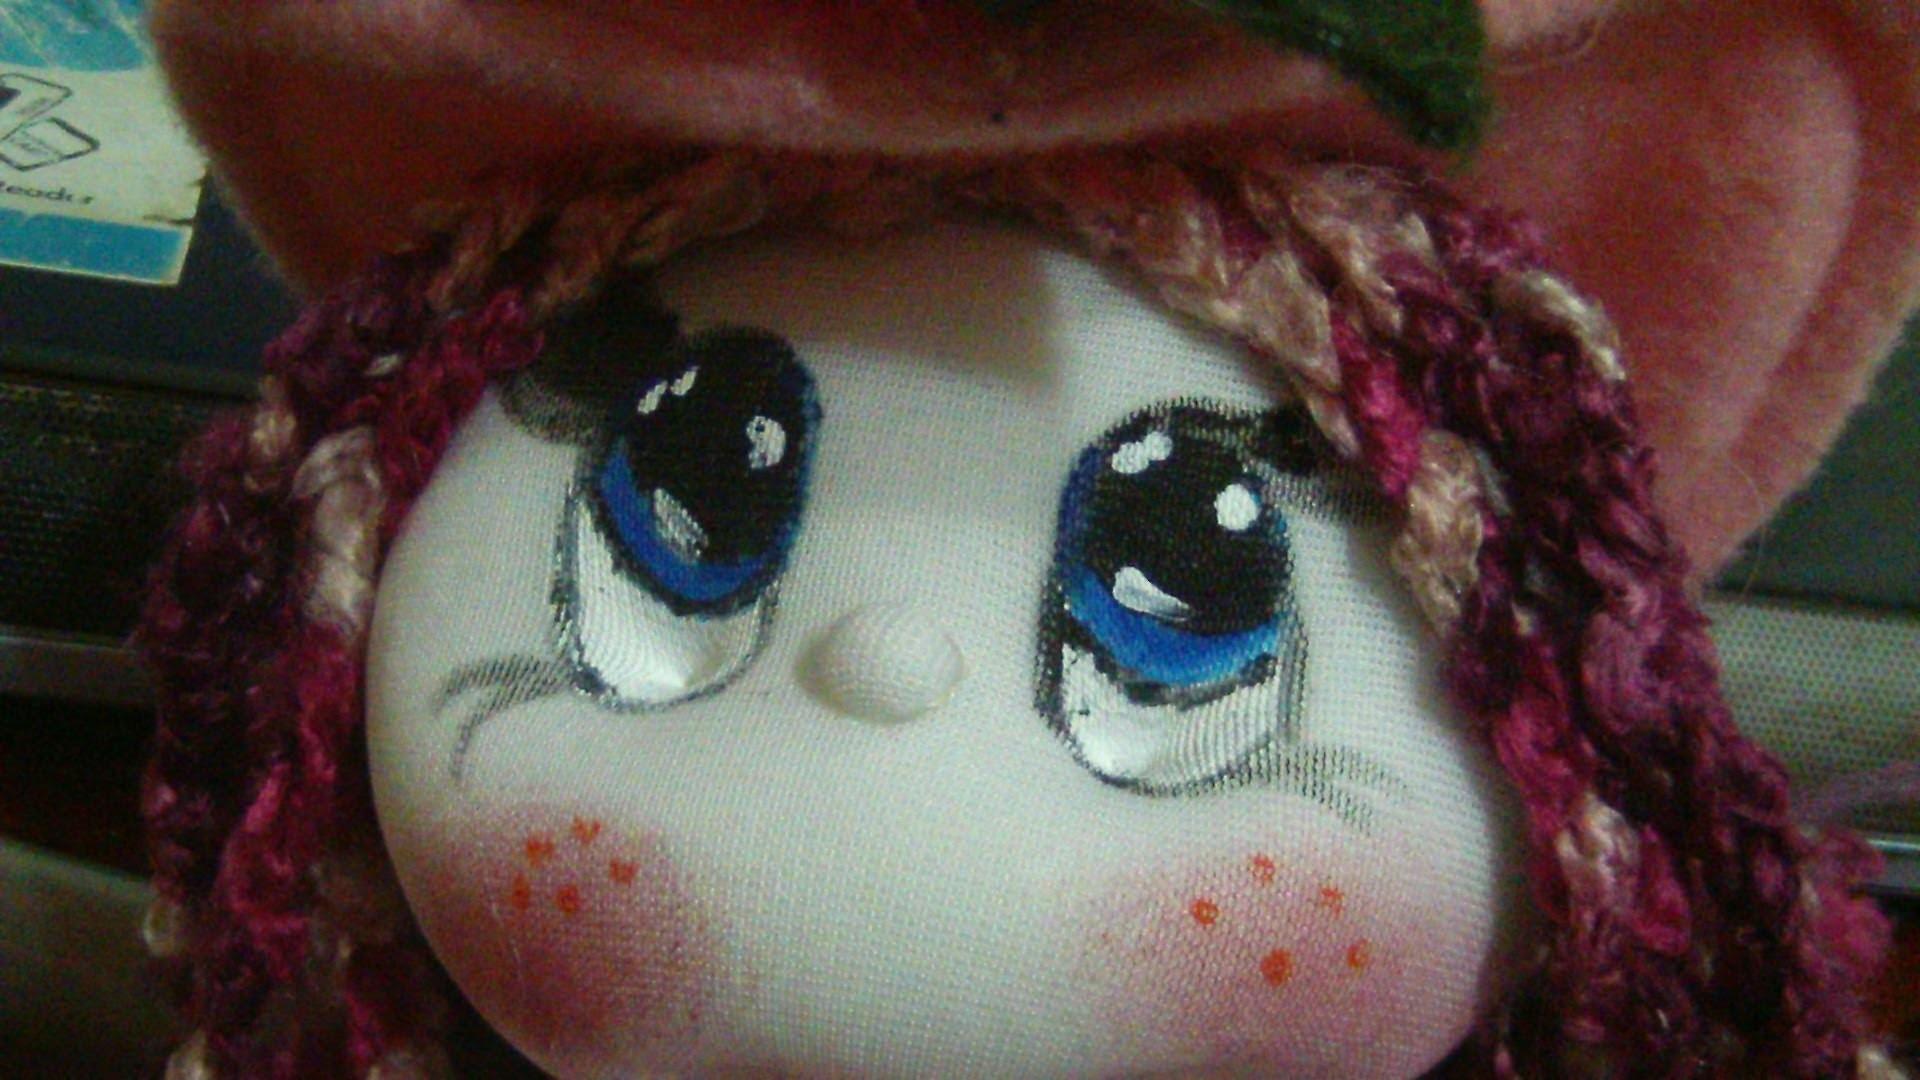 Muñecos soft. como pintar ojos faciles.how to paint eyes easily. proyecto 183